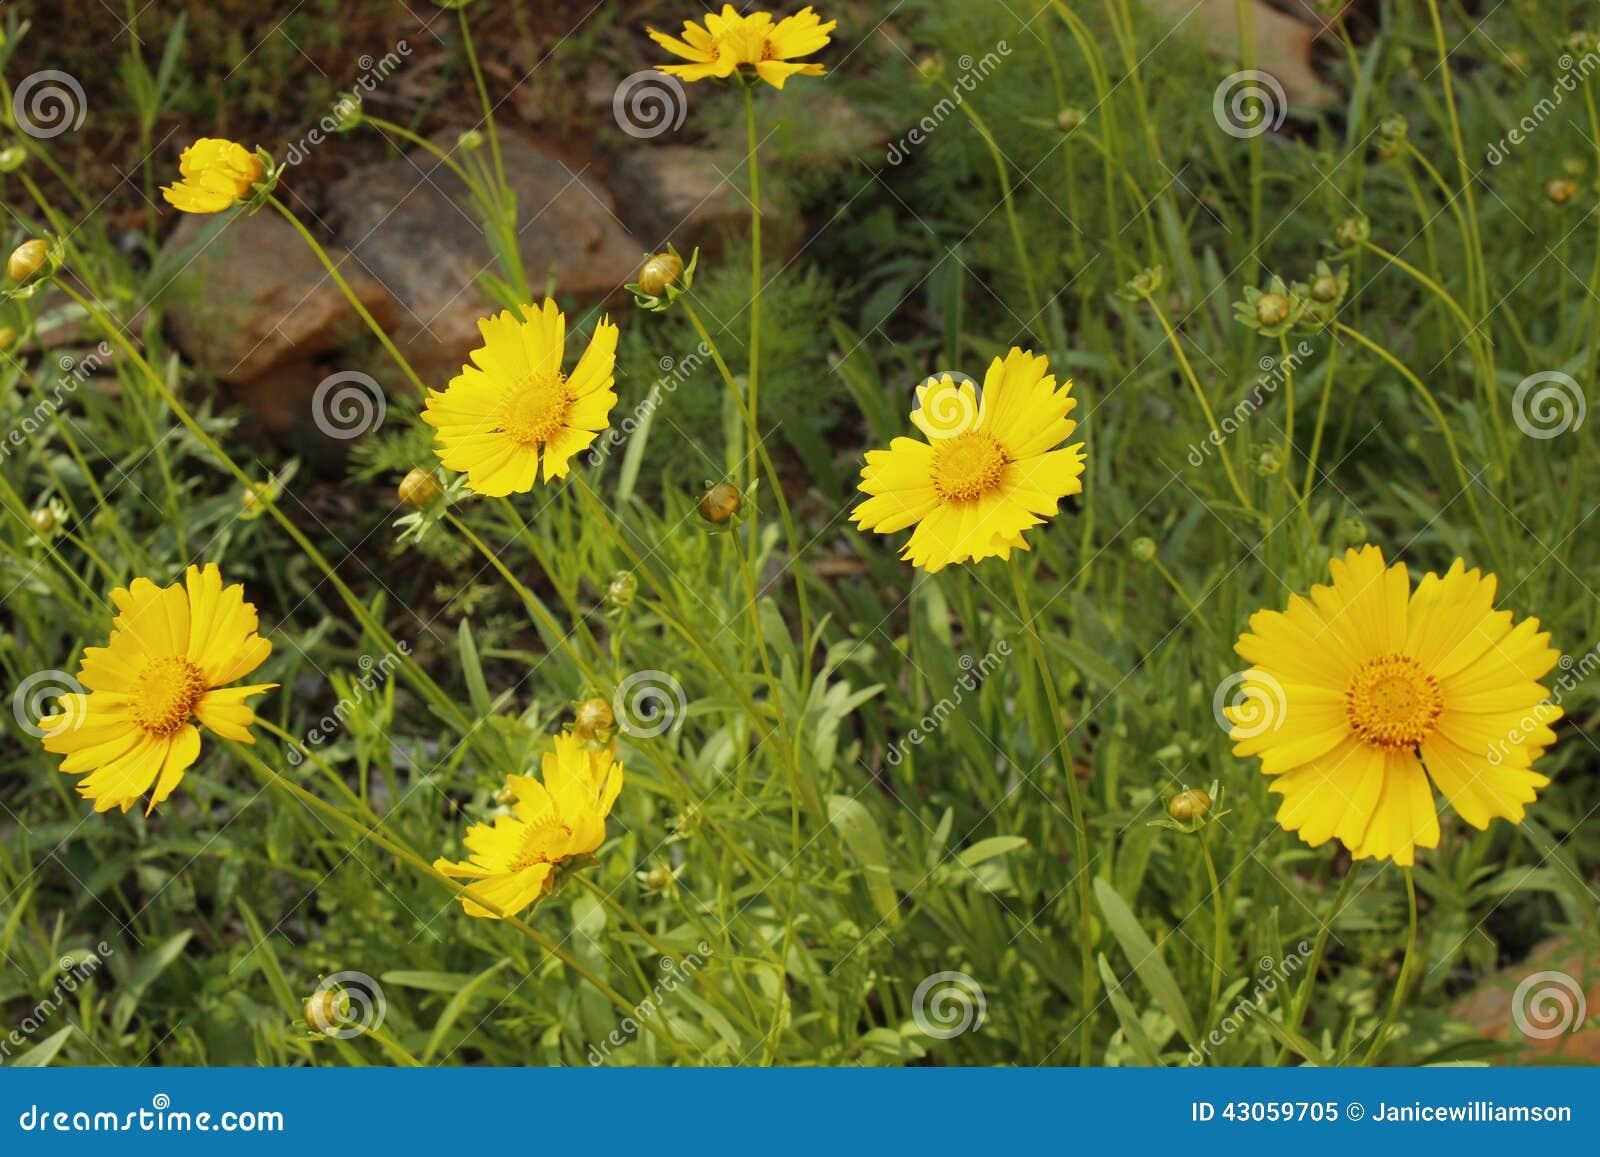 Beautiful yellow wild flower garden georgia in may stock image royalty free stock photo mightylinksfo